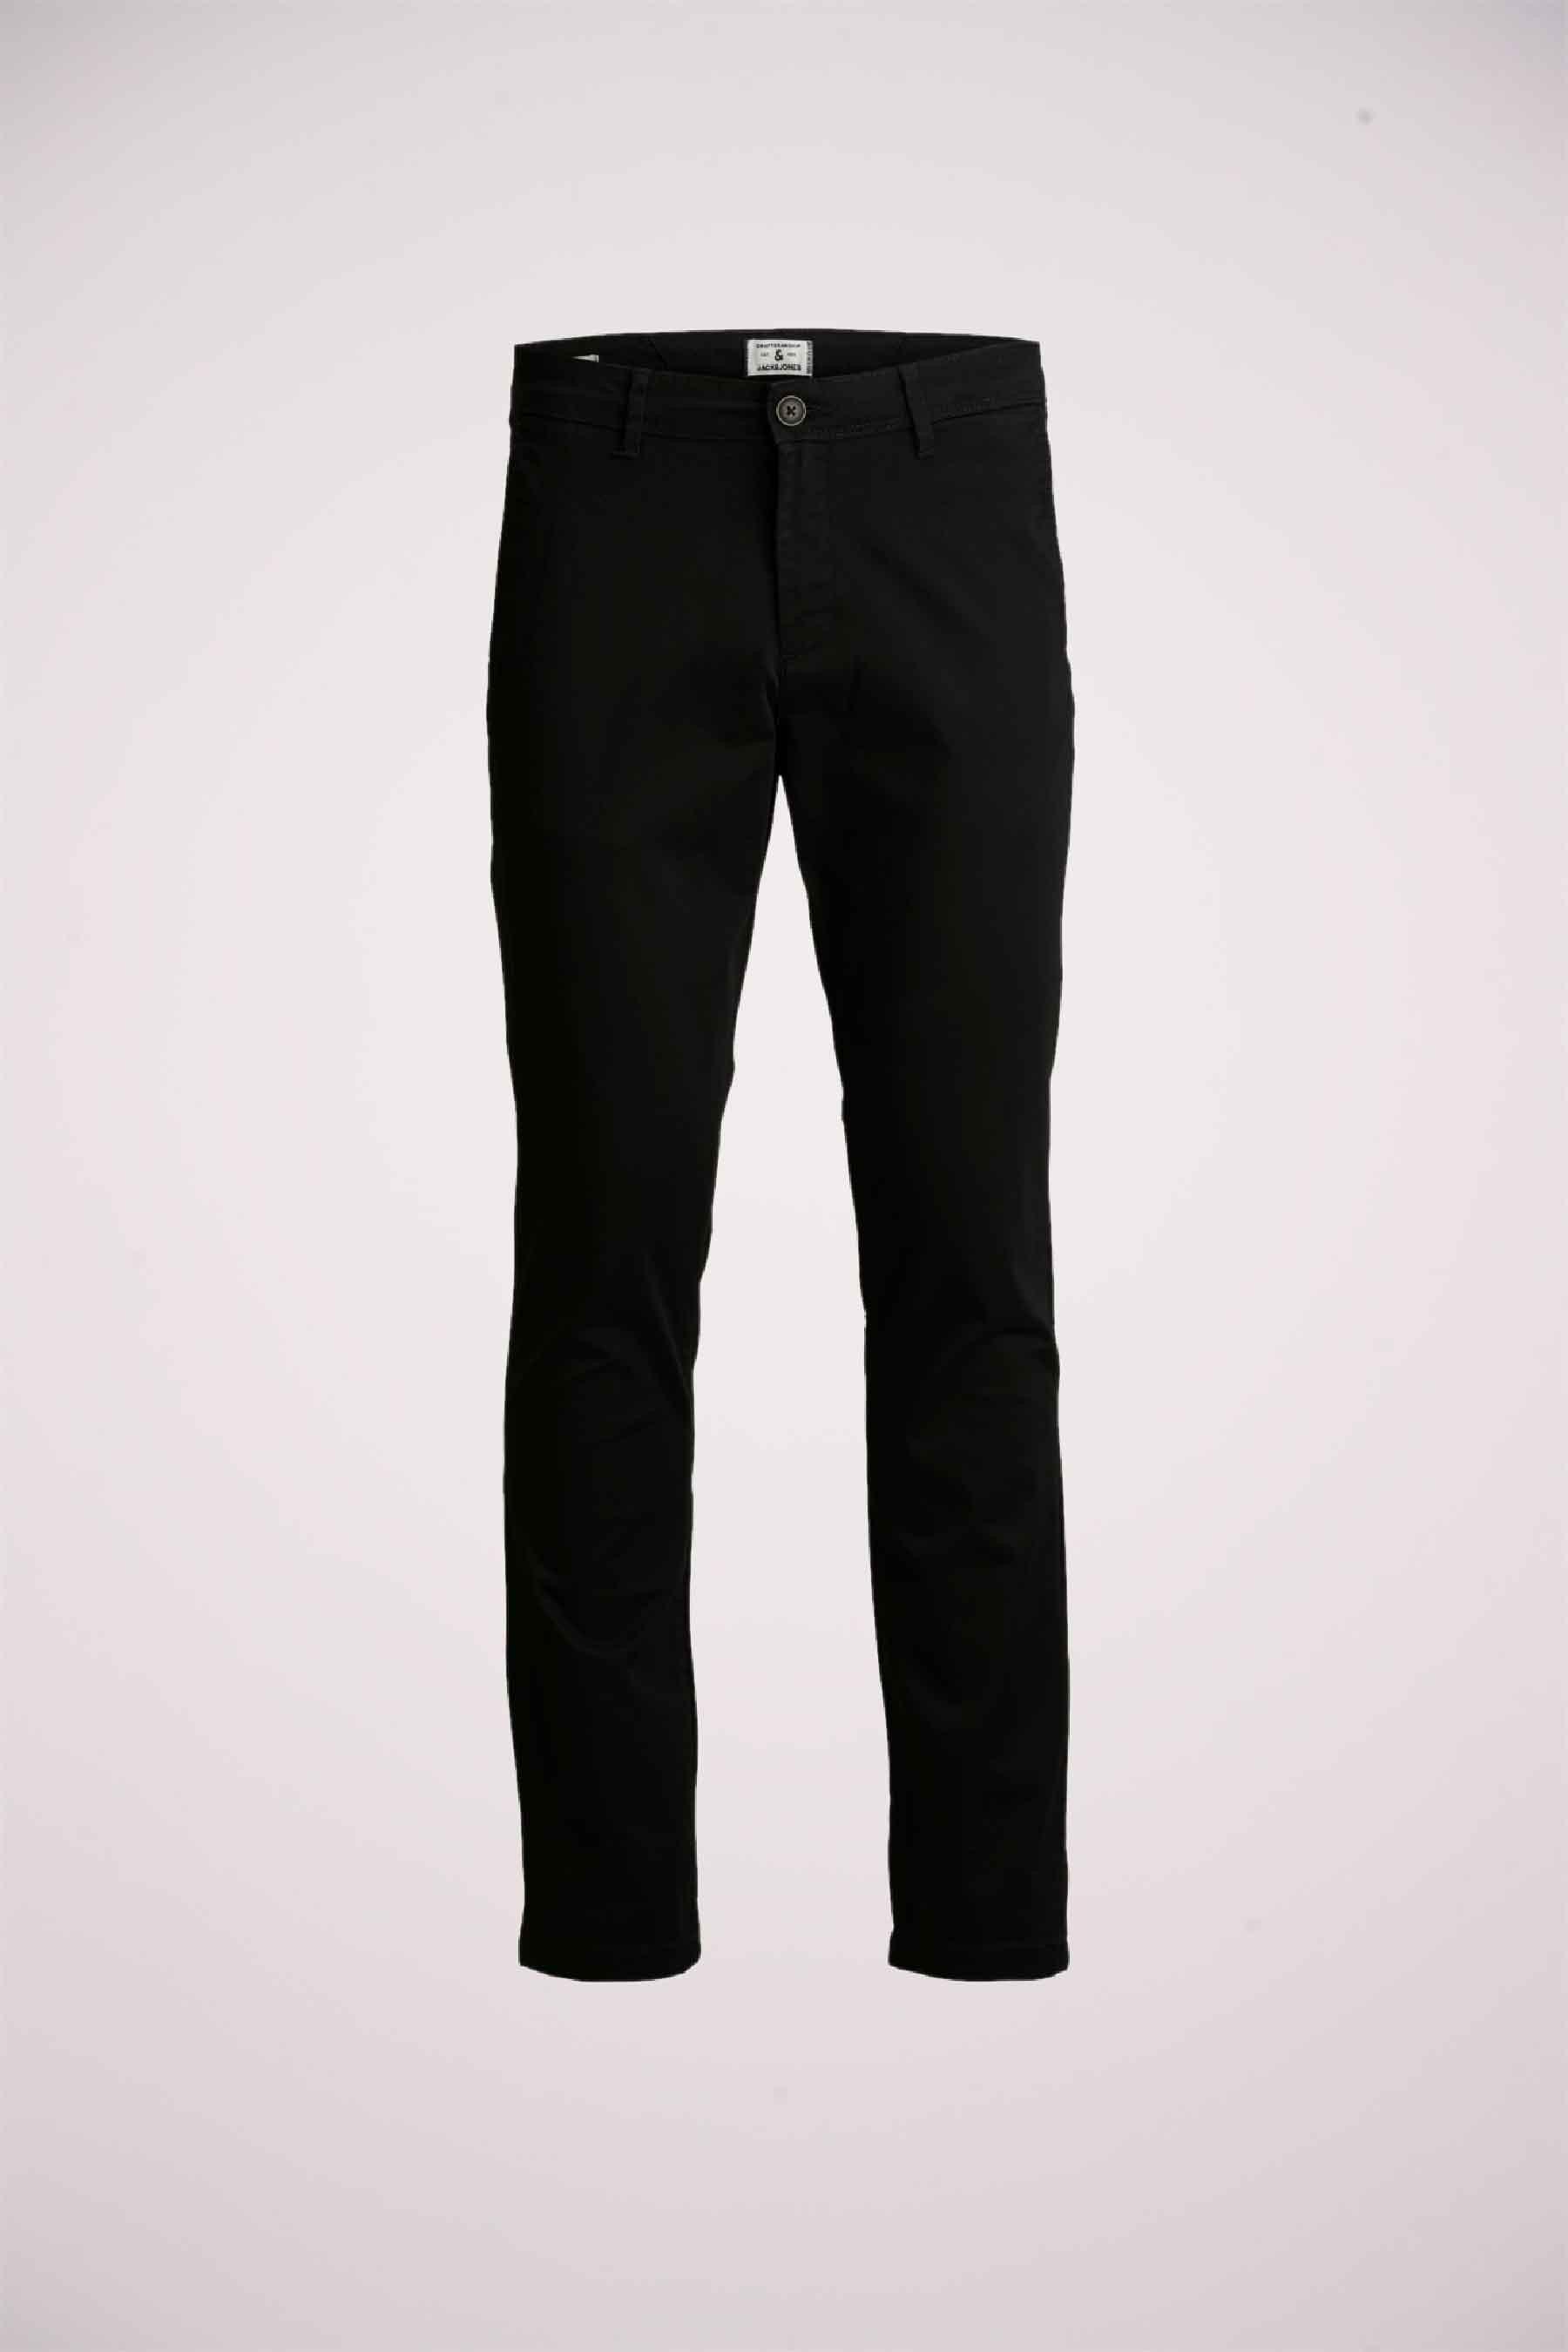 Jack & Jones Jeans Intelligenc Chino, Zwart, Heren, Maat: 32x34